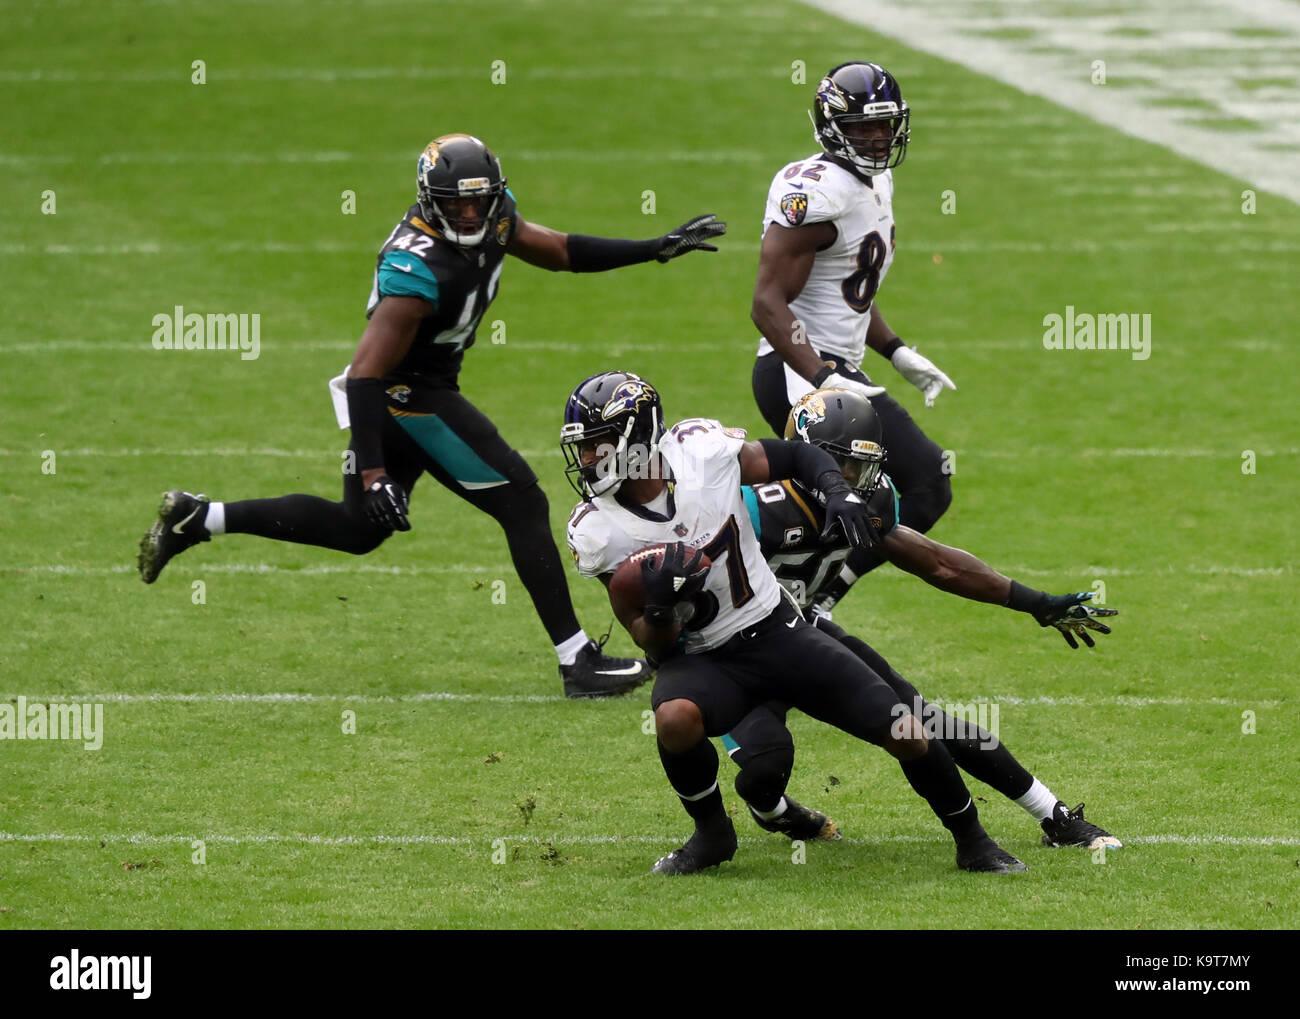 Baltimore Ravens Javorius Allen is tackled by Jacksonville Jaguars